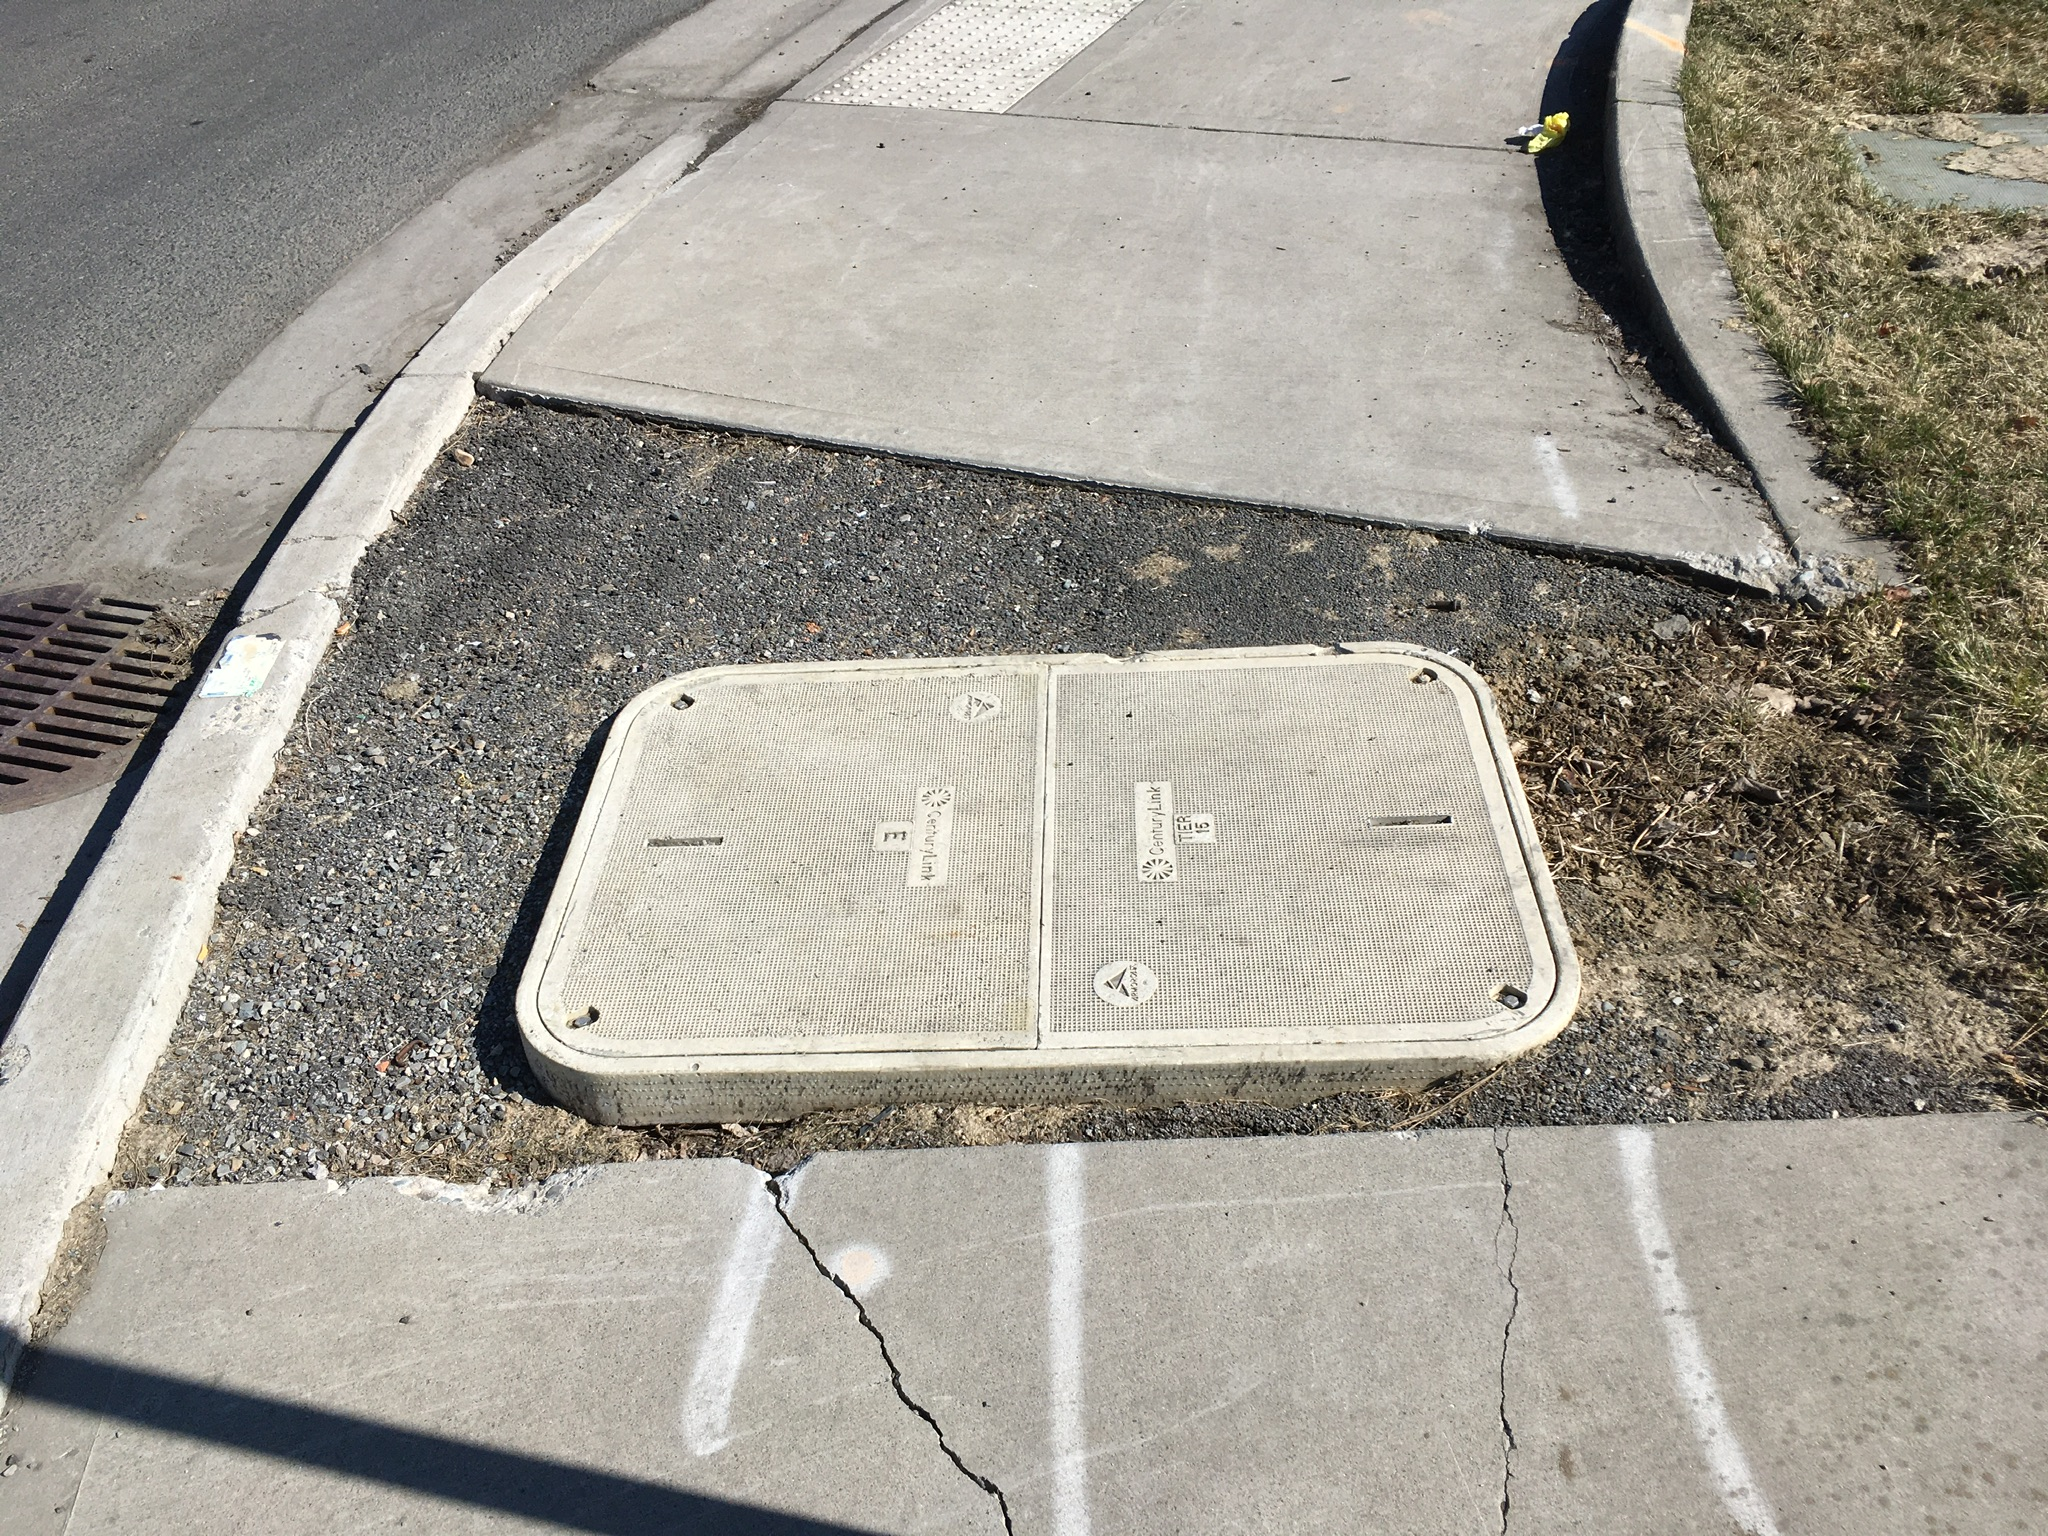 Sidewalk cracks and obstacles